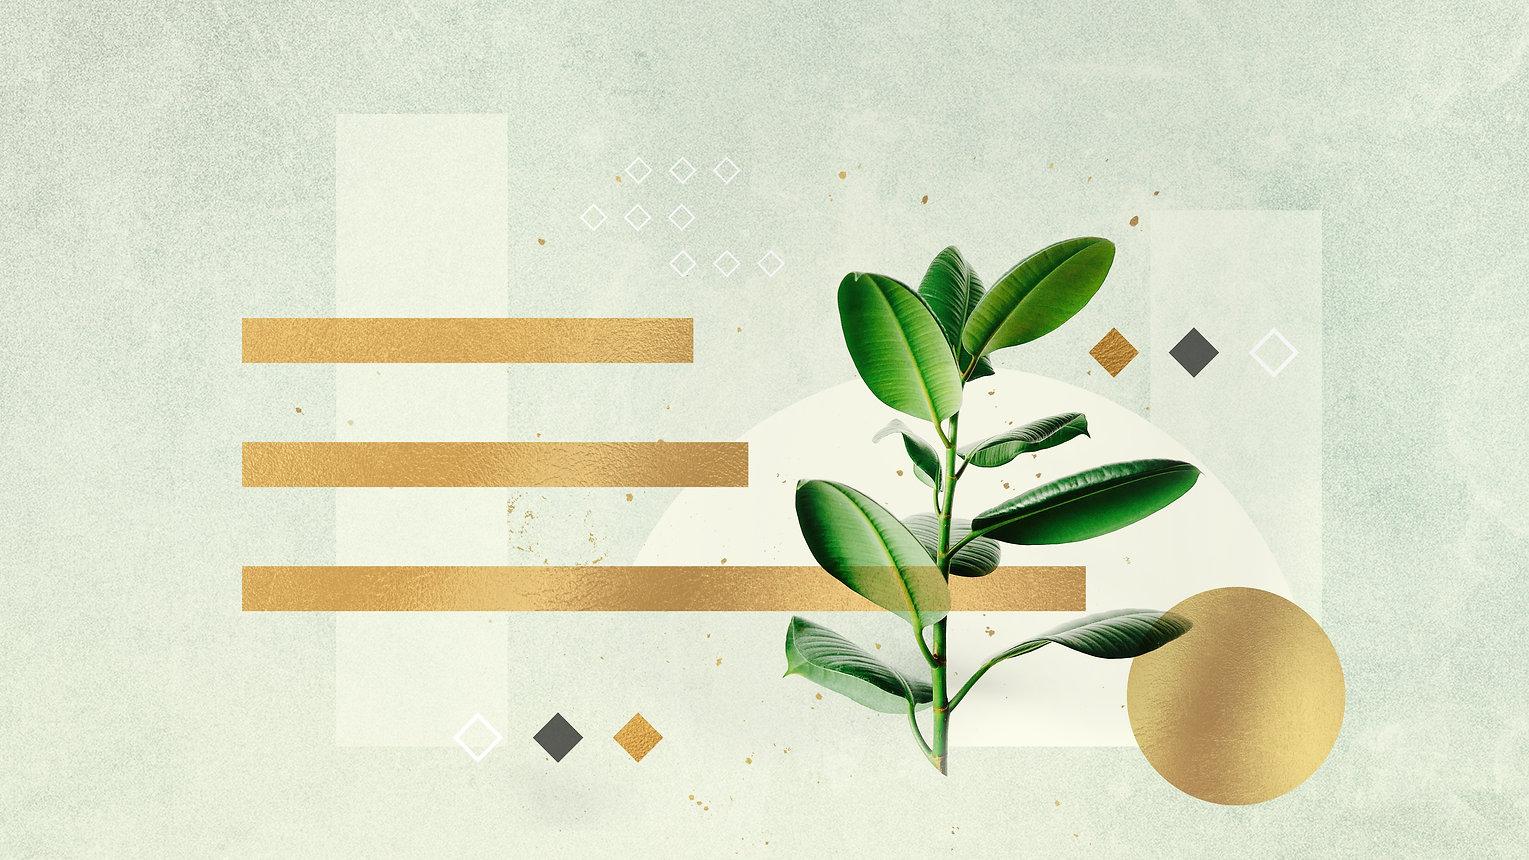 ComeGrow-Theme-Blank.jpg